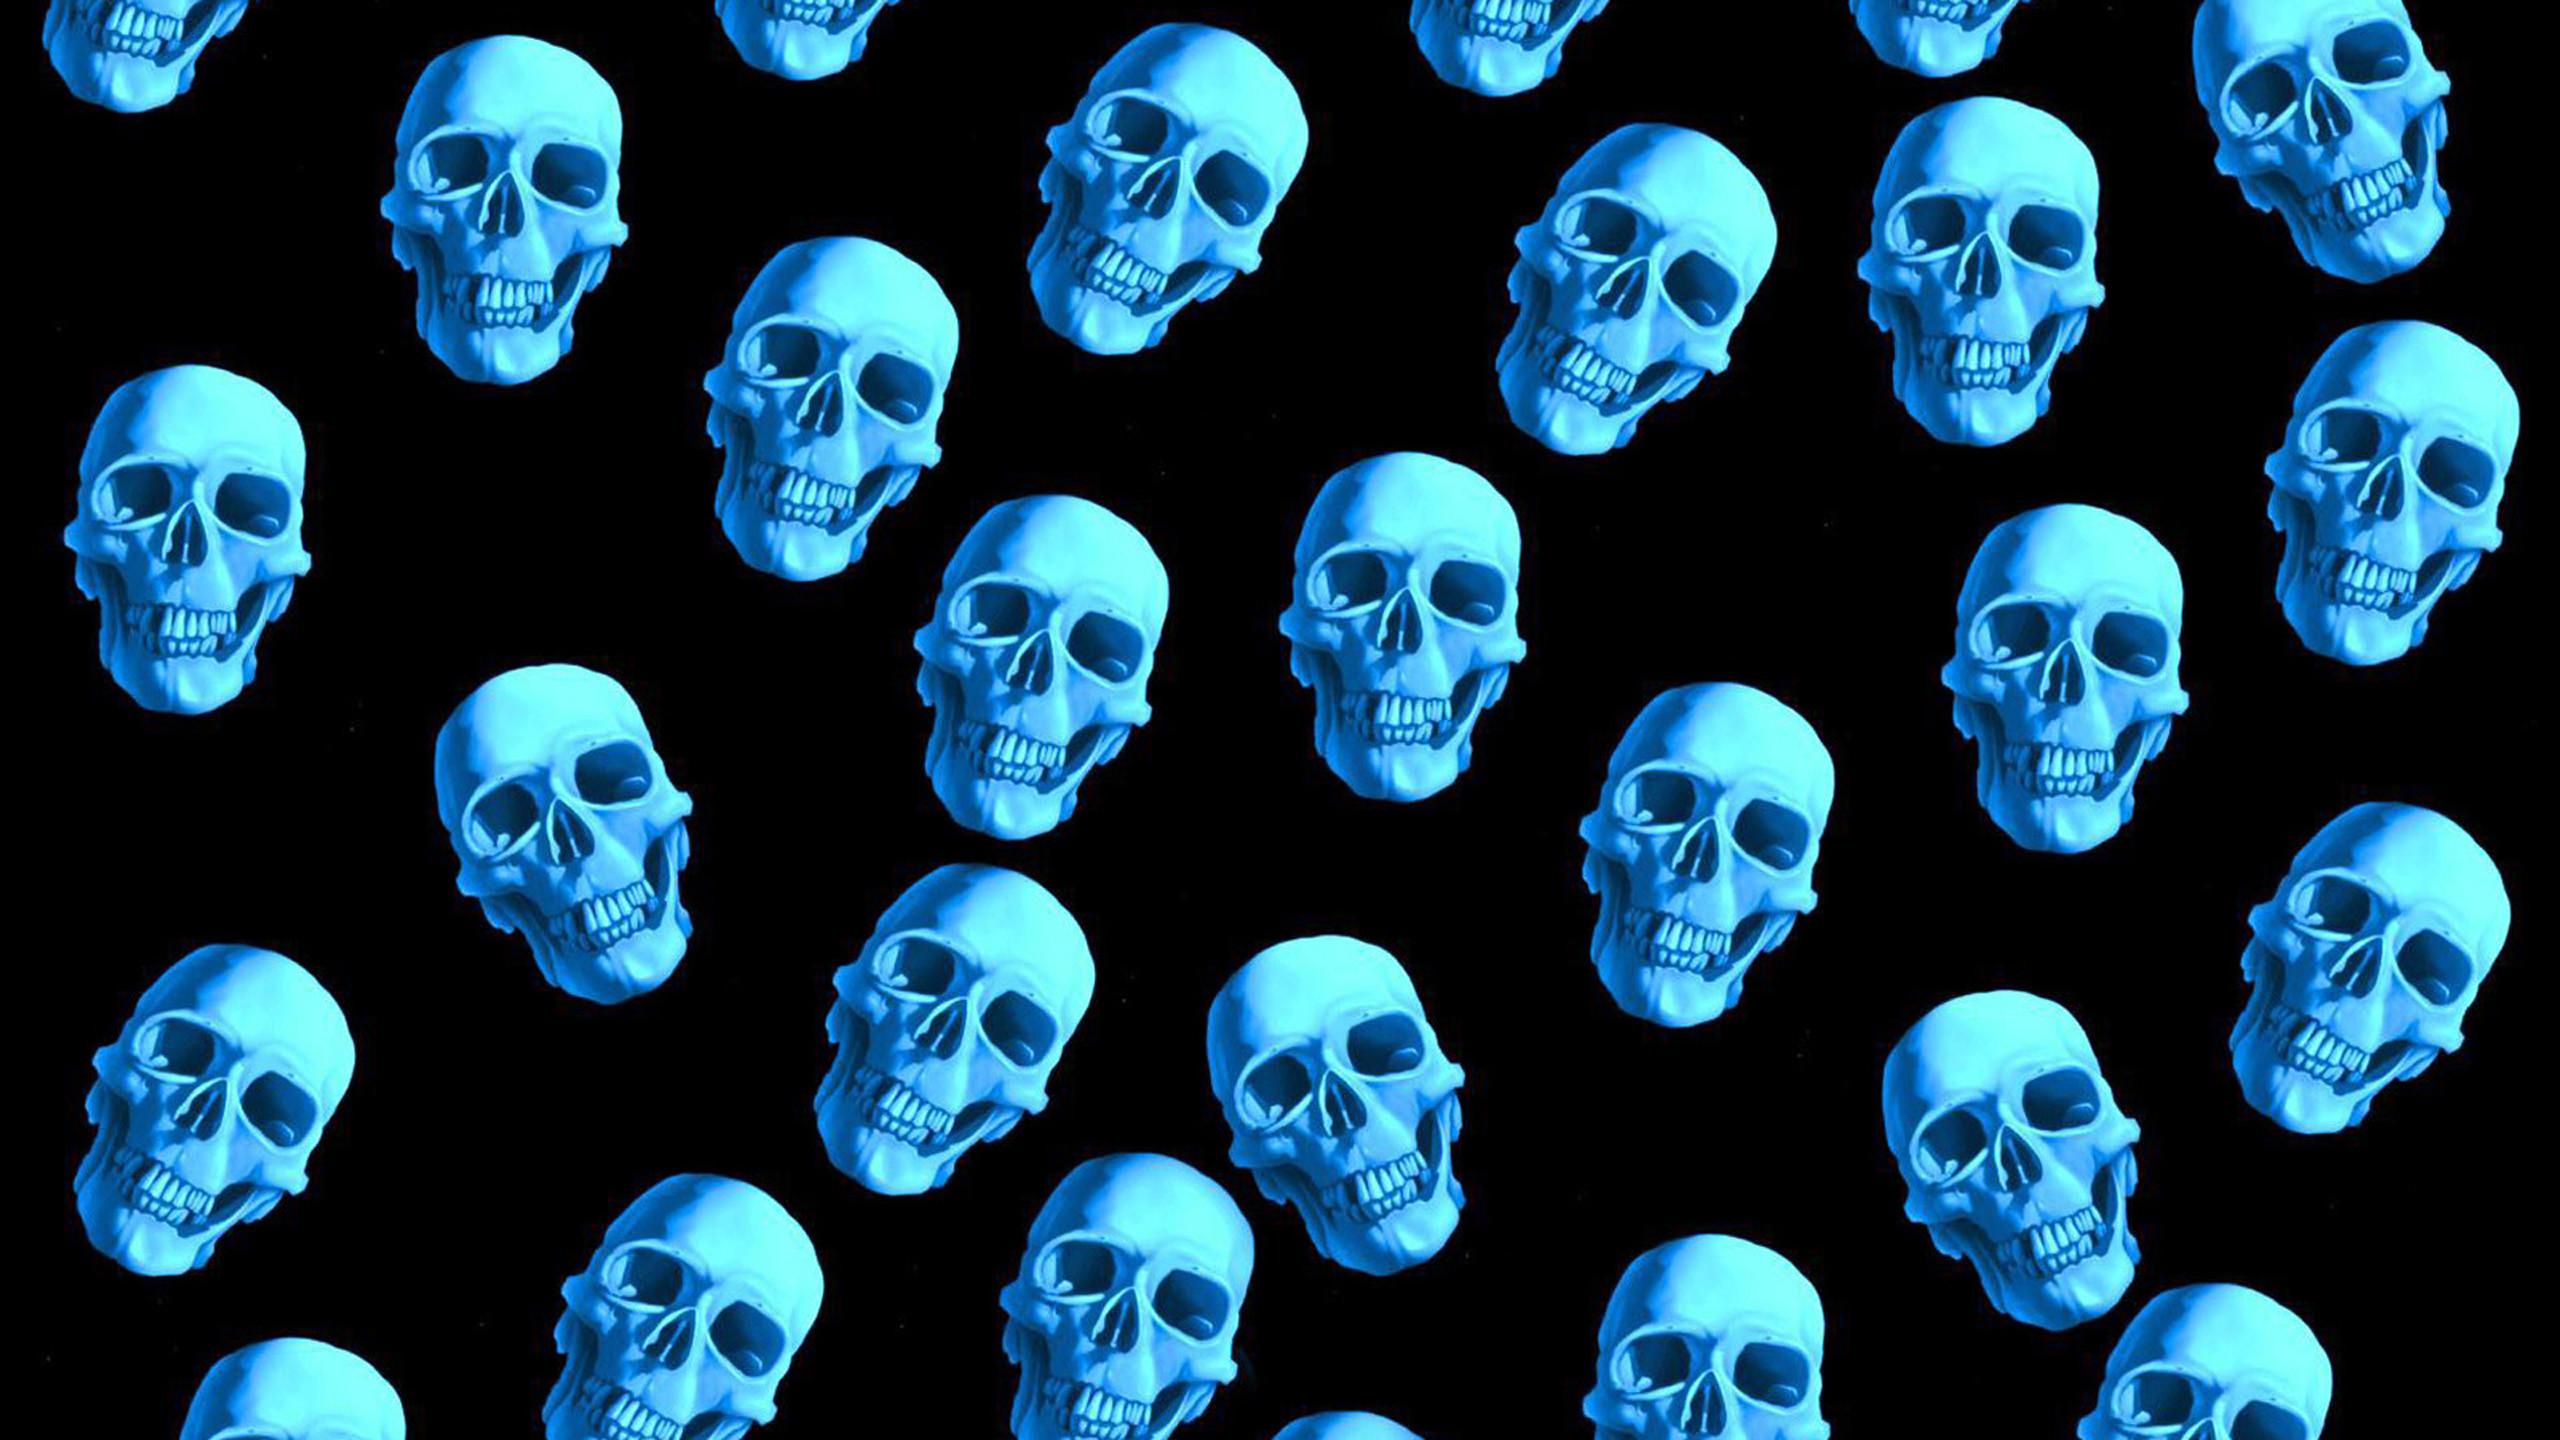 Skeleton Pattern Wallpaper Cute Blue Fire Skull Wallpaper 58 Images